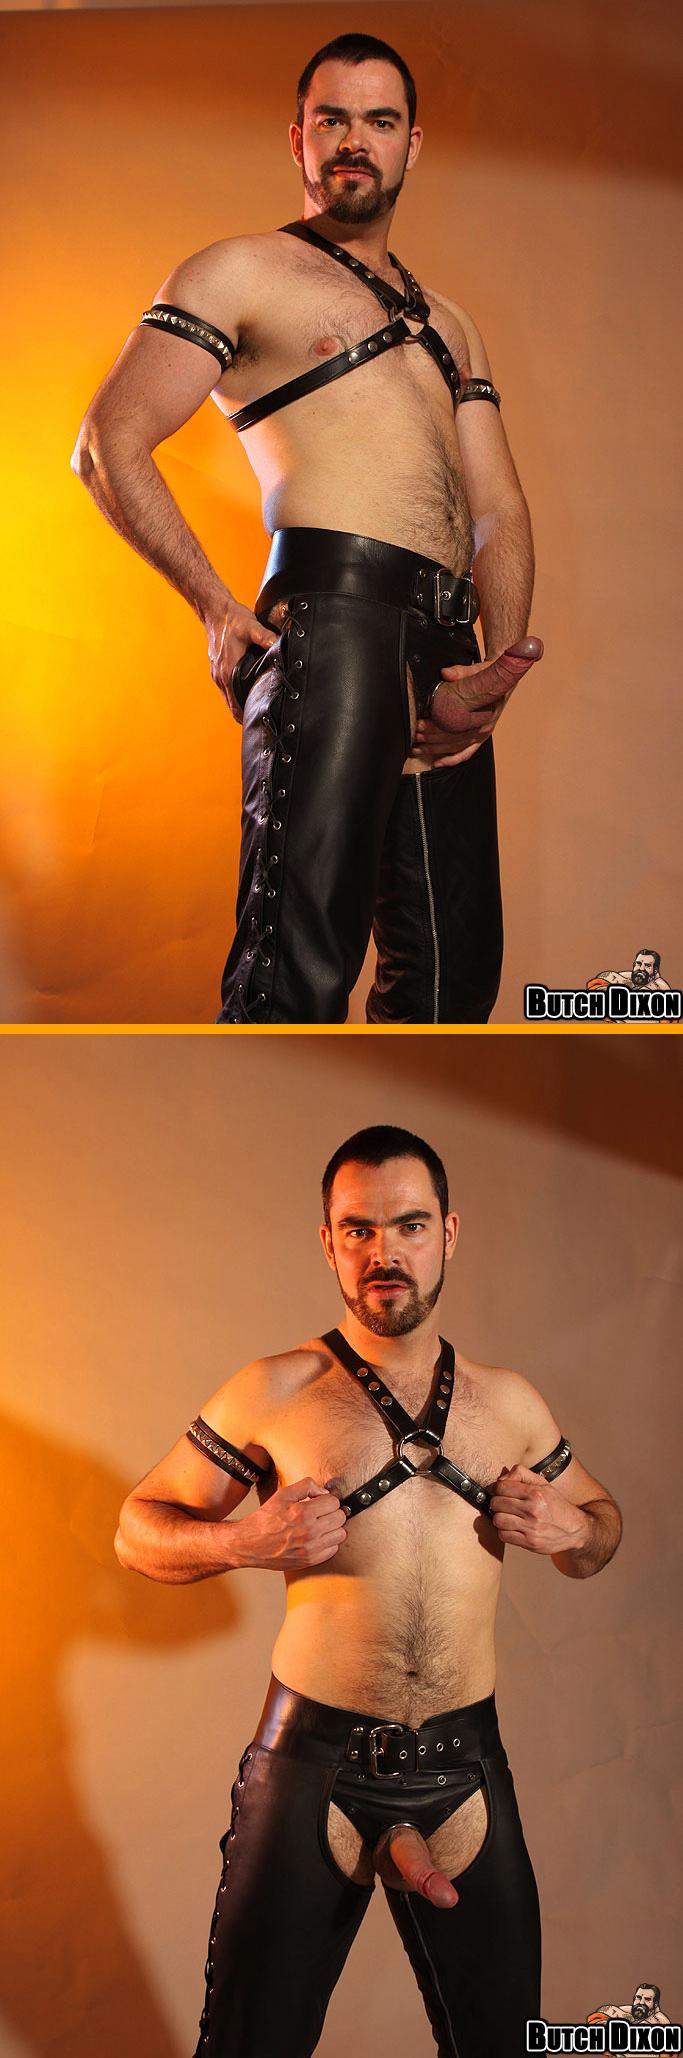 Dolan Wolf in a Leather Jockstrap